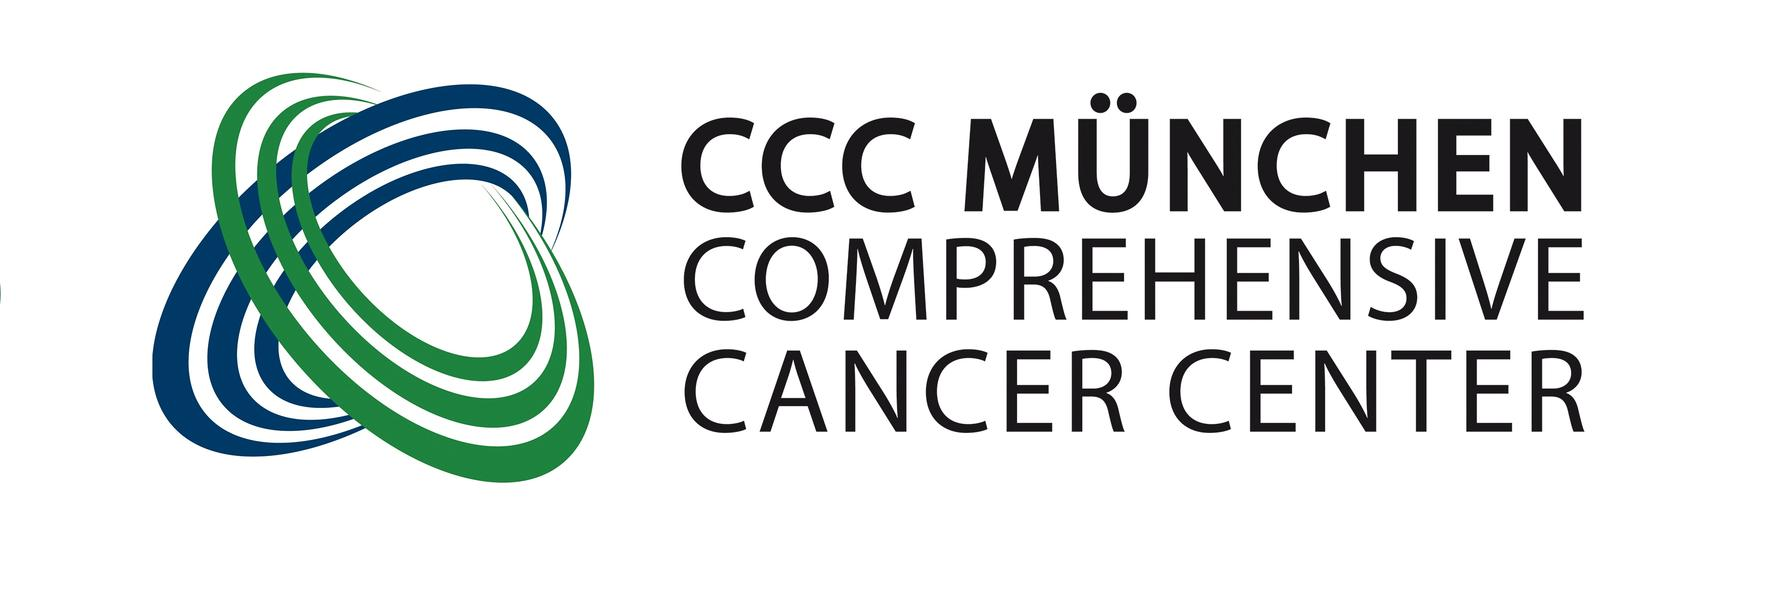 CCC München